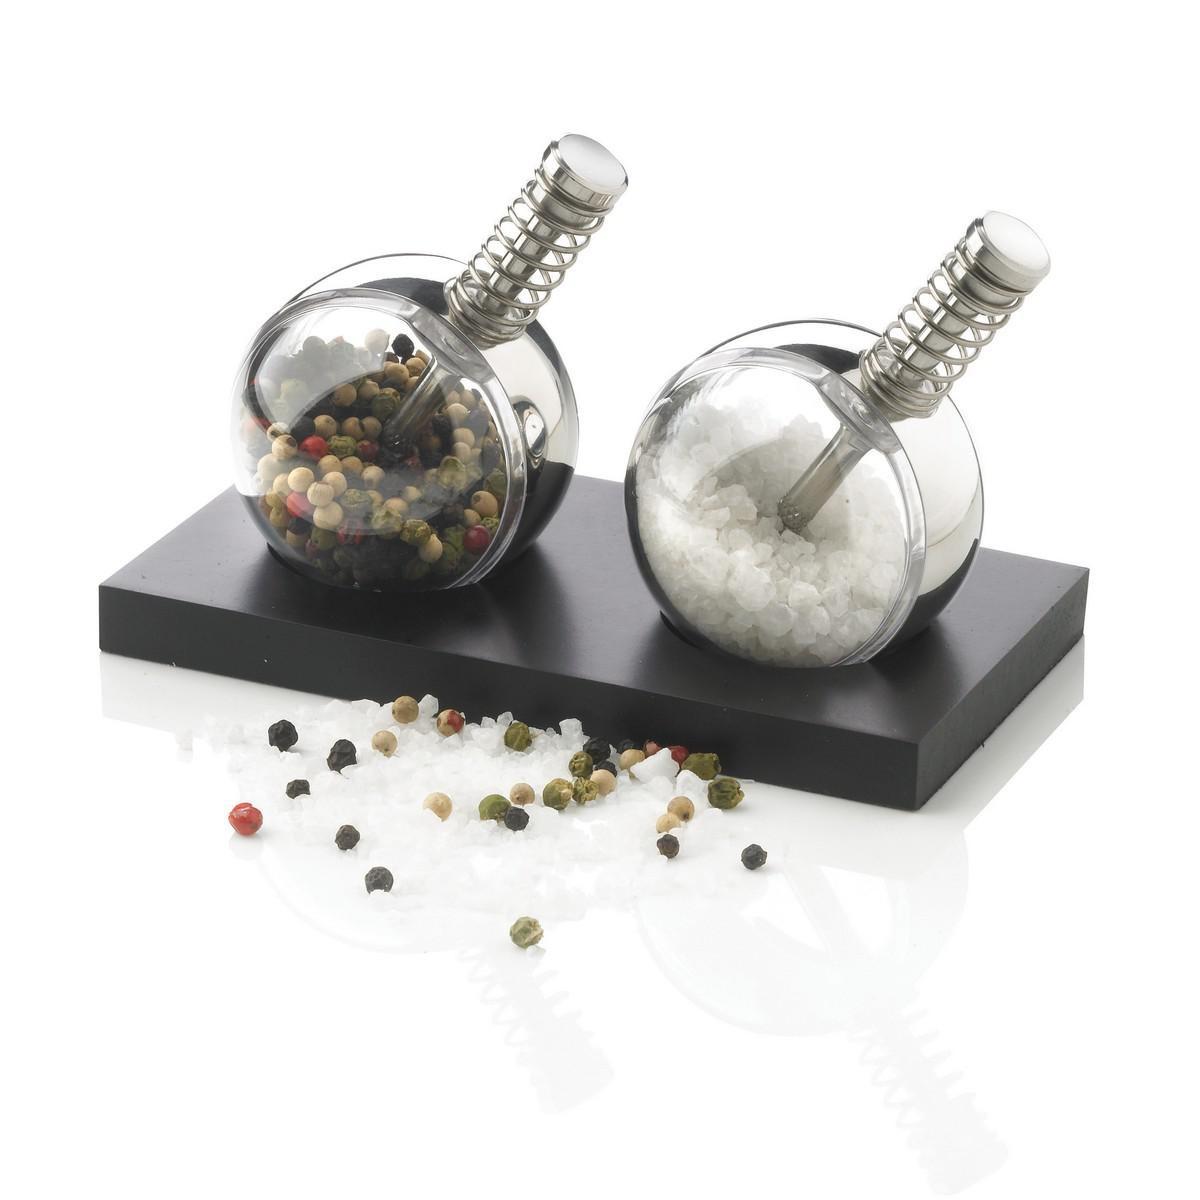 Planet Salt Amp Pepper Mill Set Xd Design Design Is This